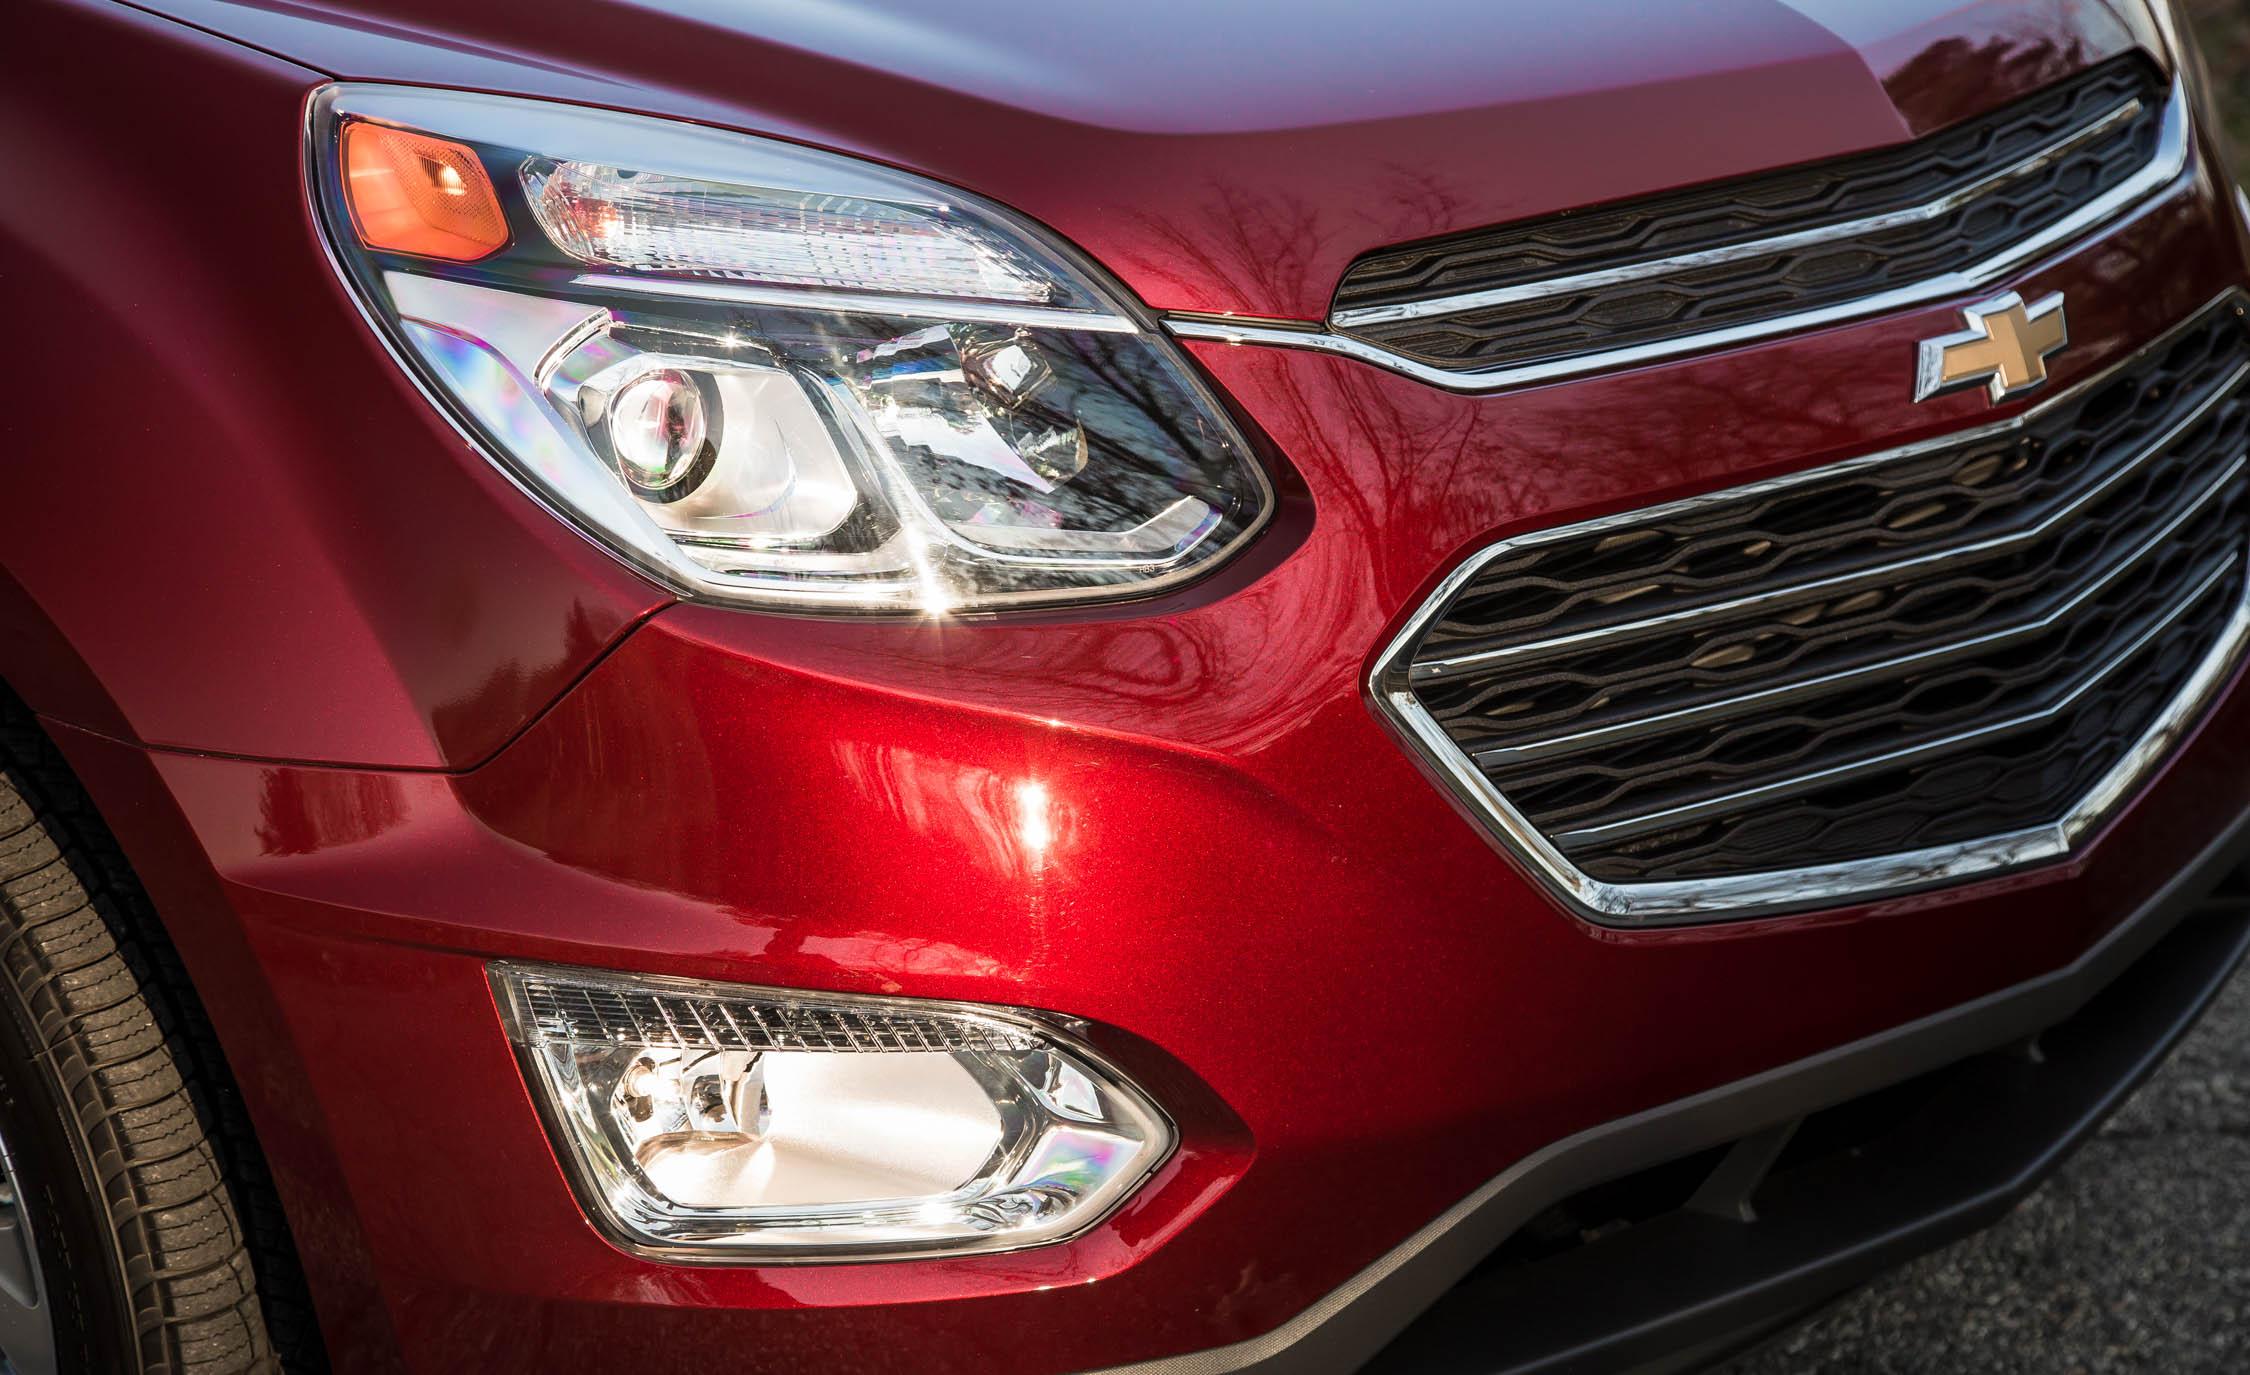 2016 Chevrolet Equinox LTZ Exterior Headlight